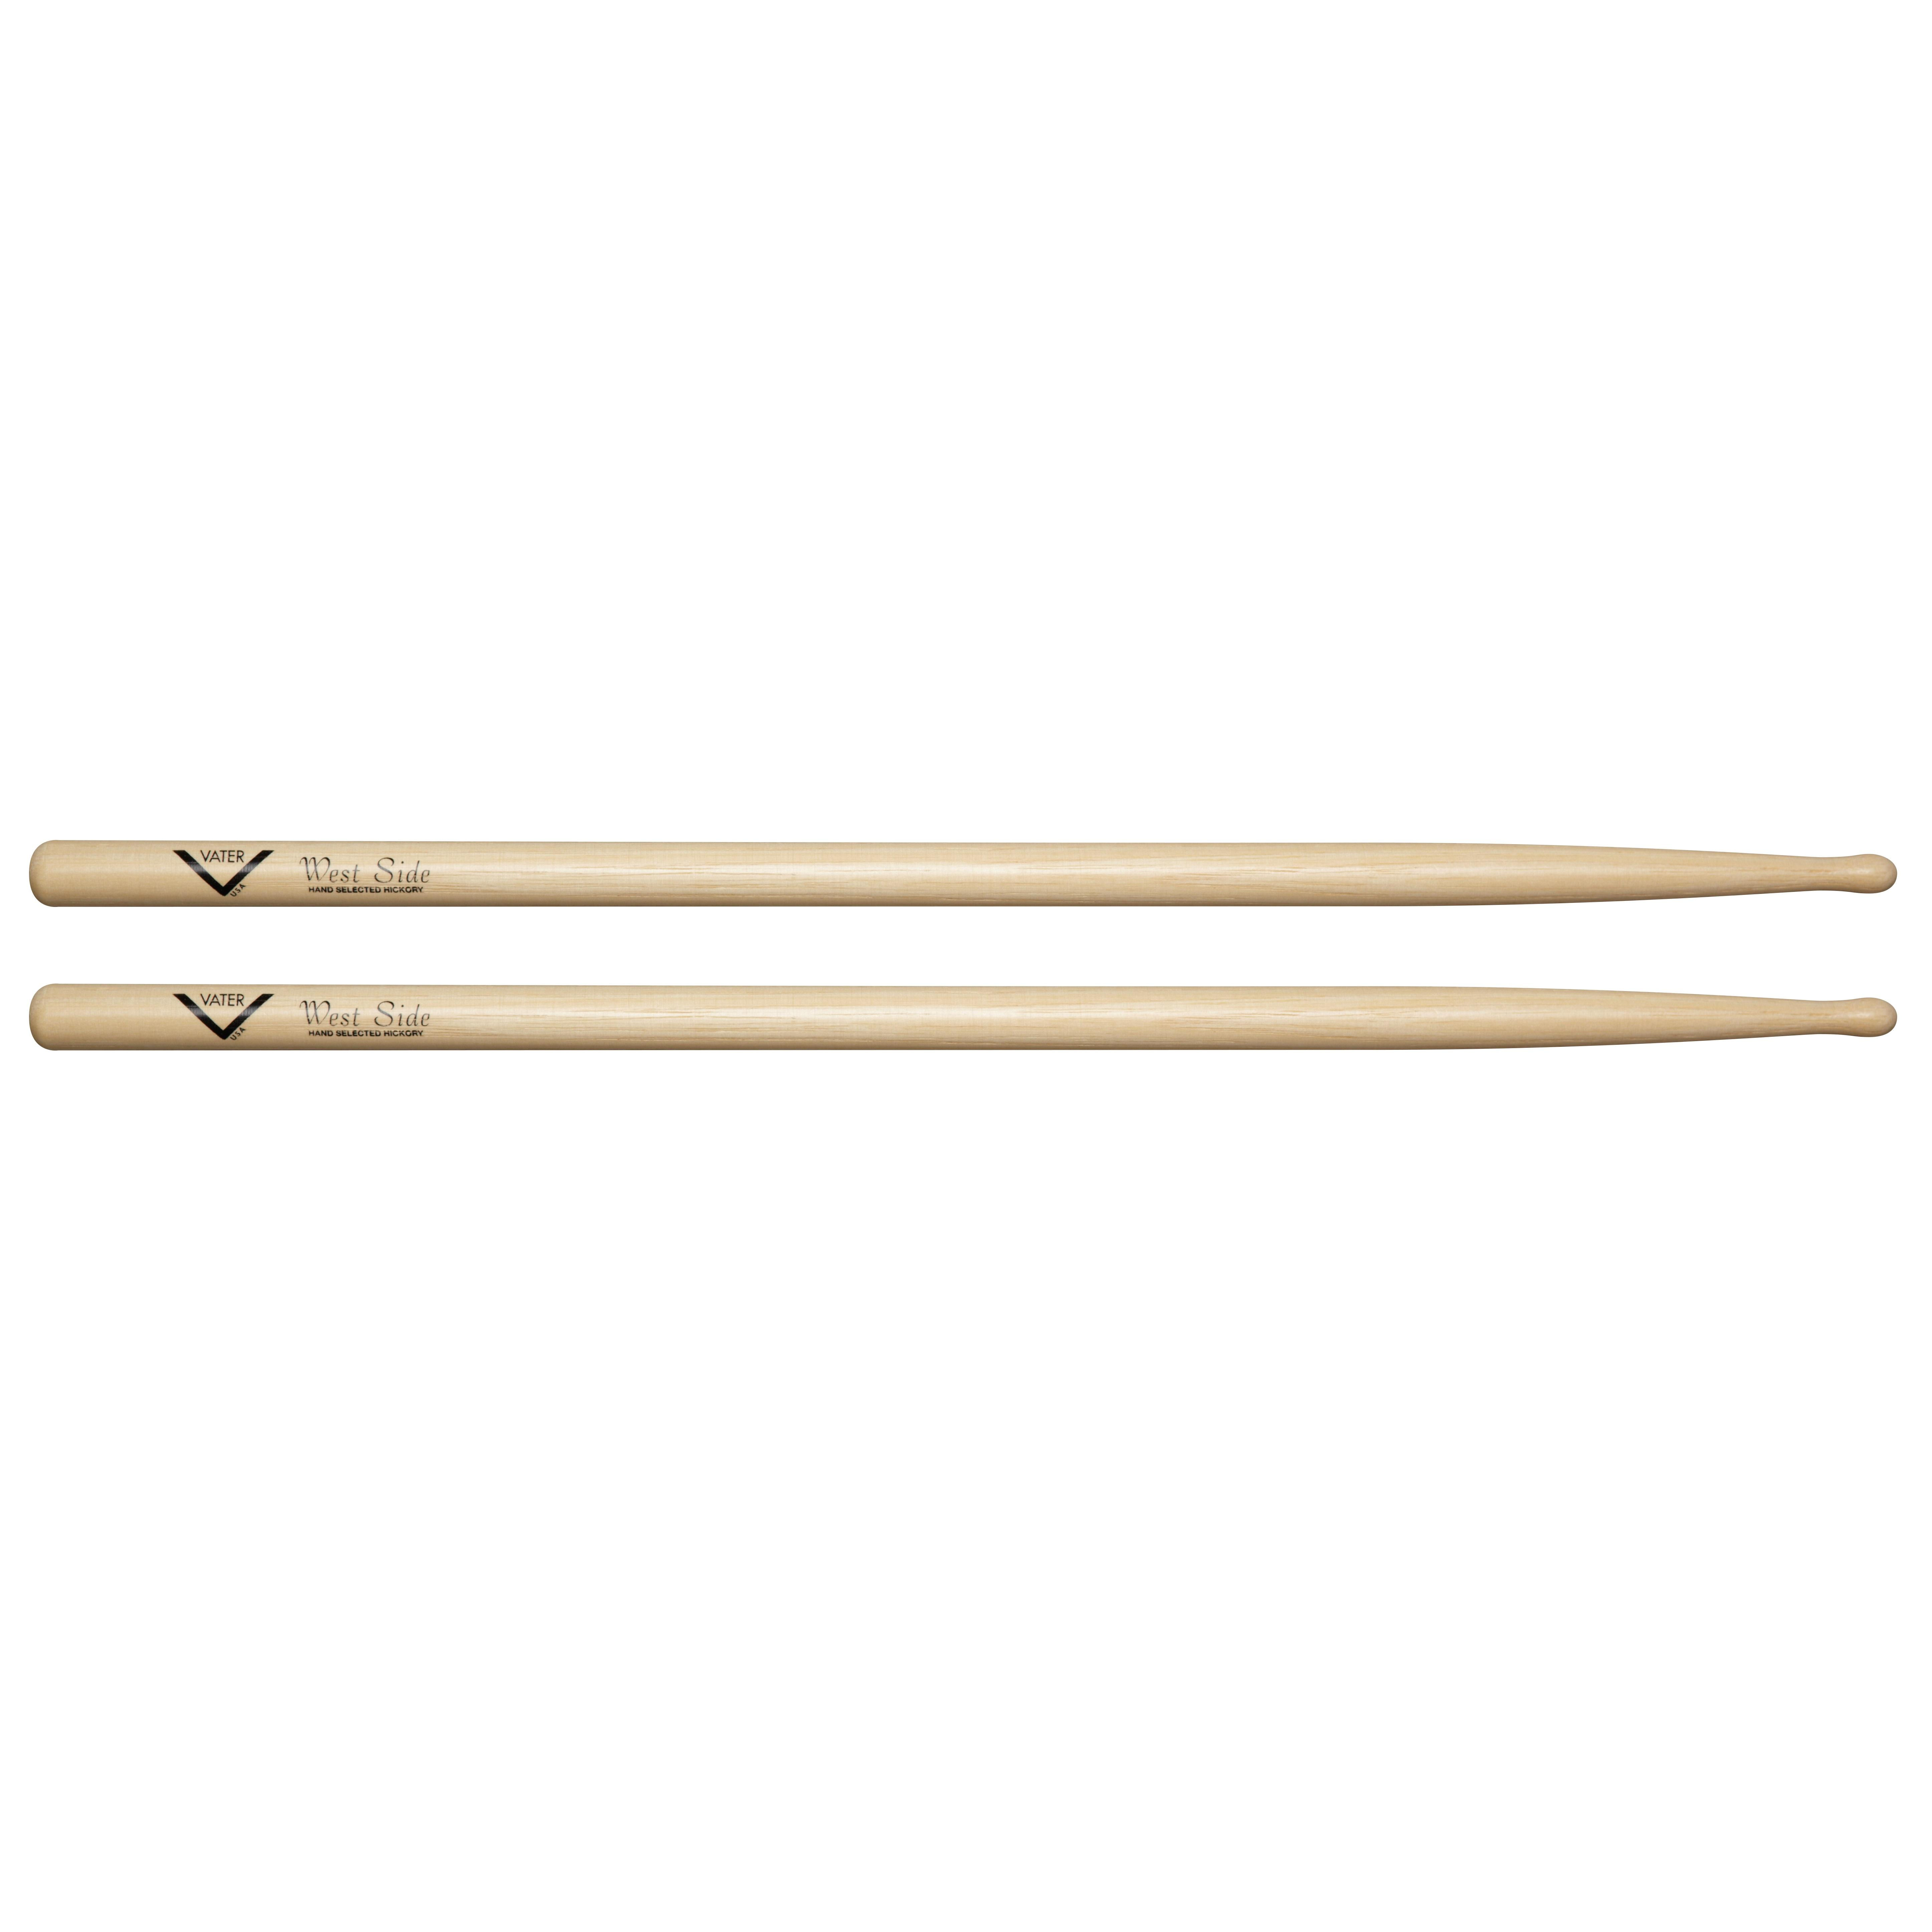 amazon com vater vhws west side hickory drum sticks oval tip